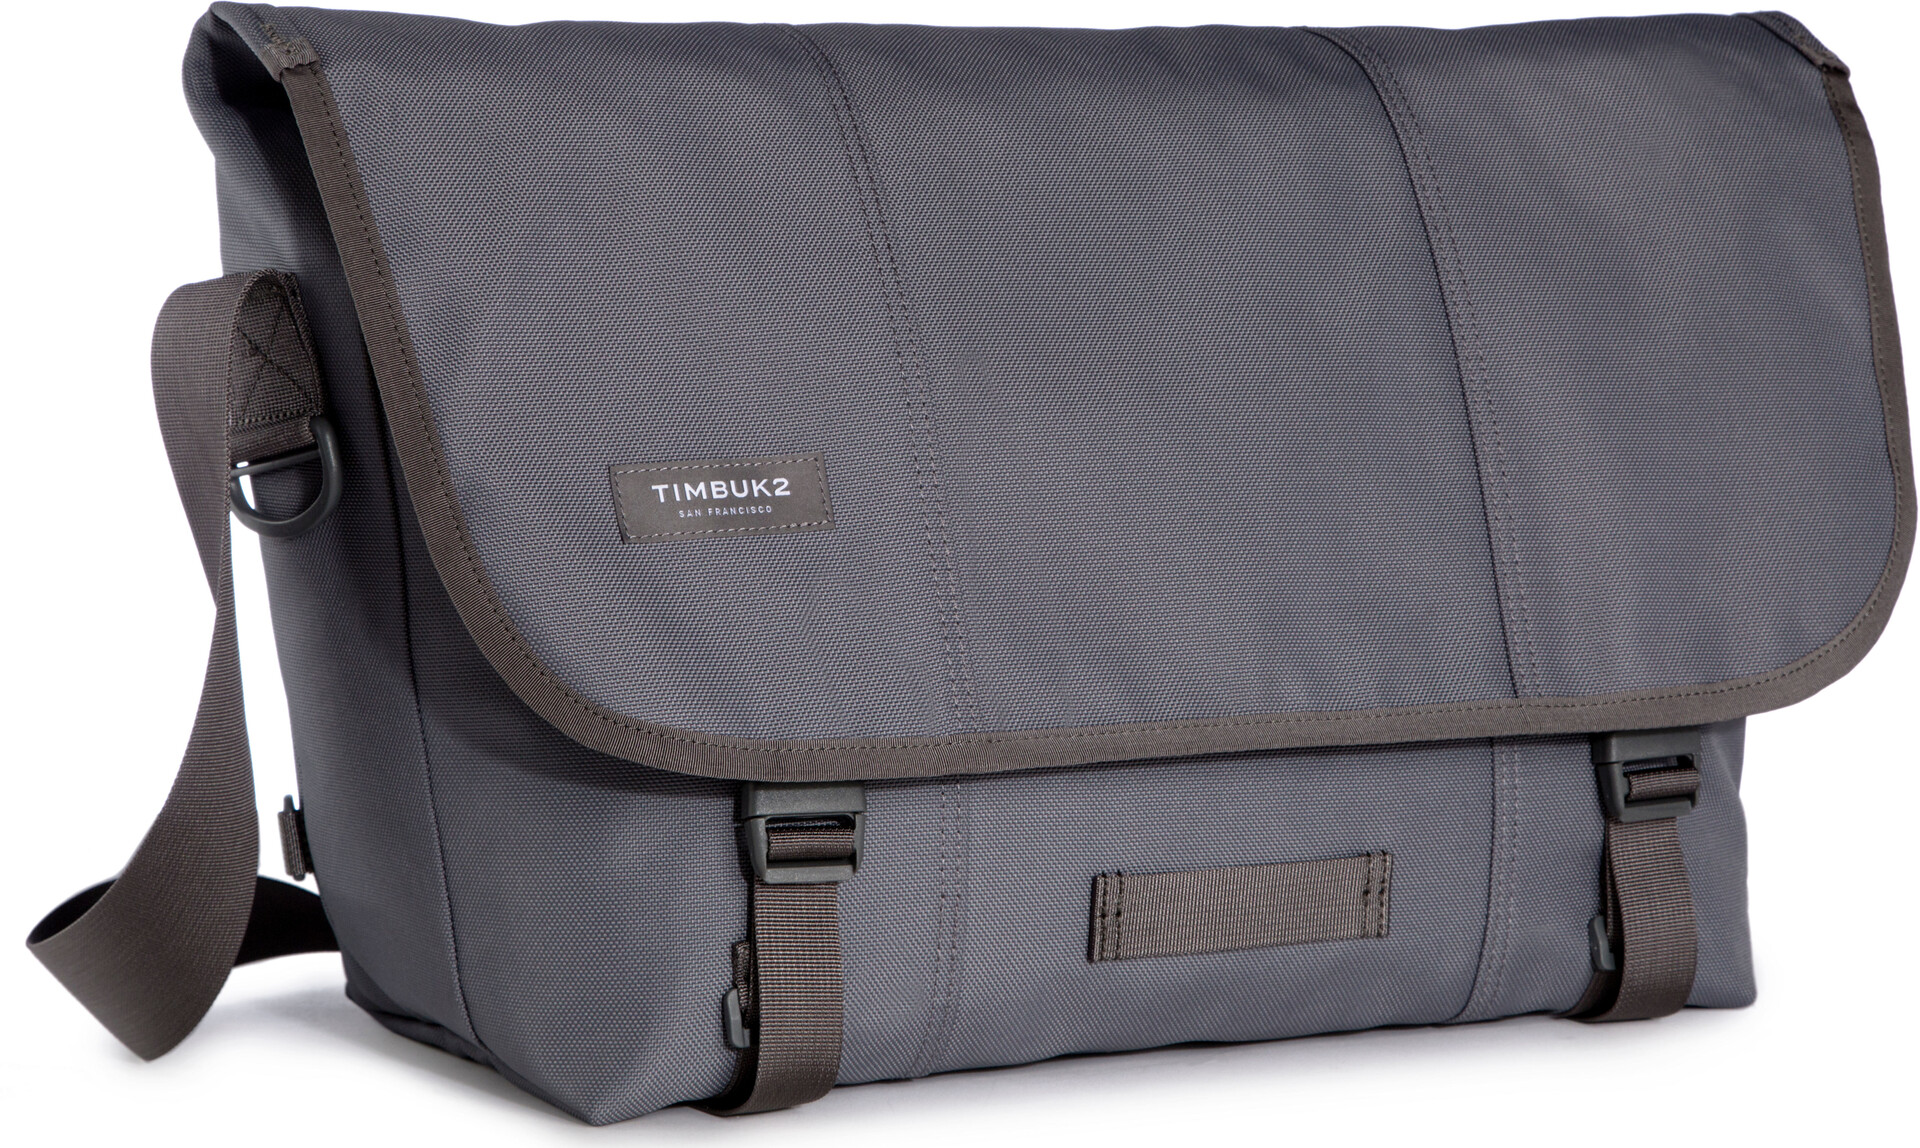 93c98c902e Timbuk classic messenger bag gunmetal jpg 5120x3062 Timbuk2 messenger bag